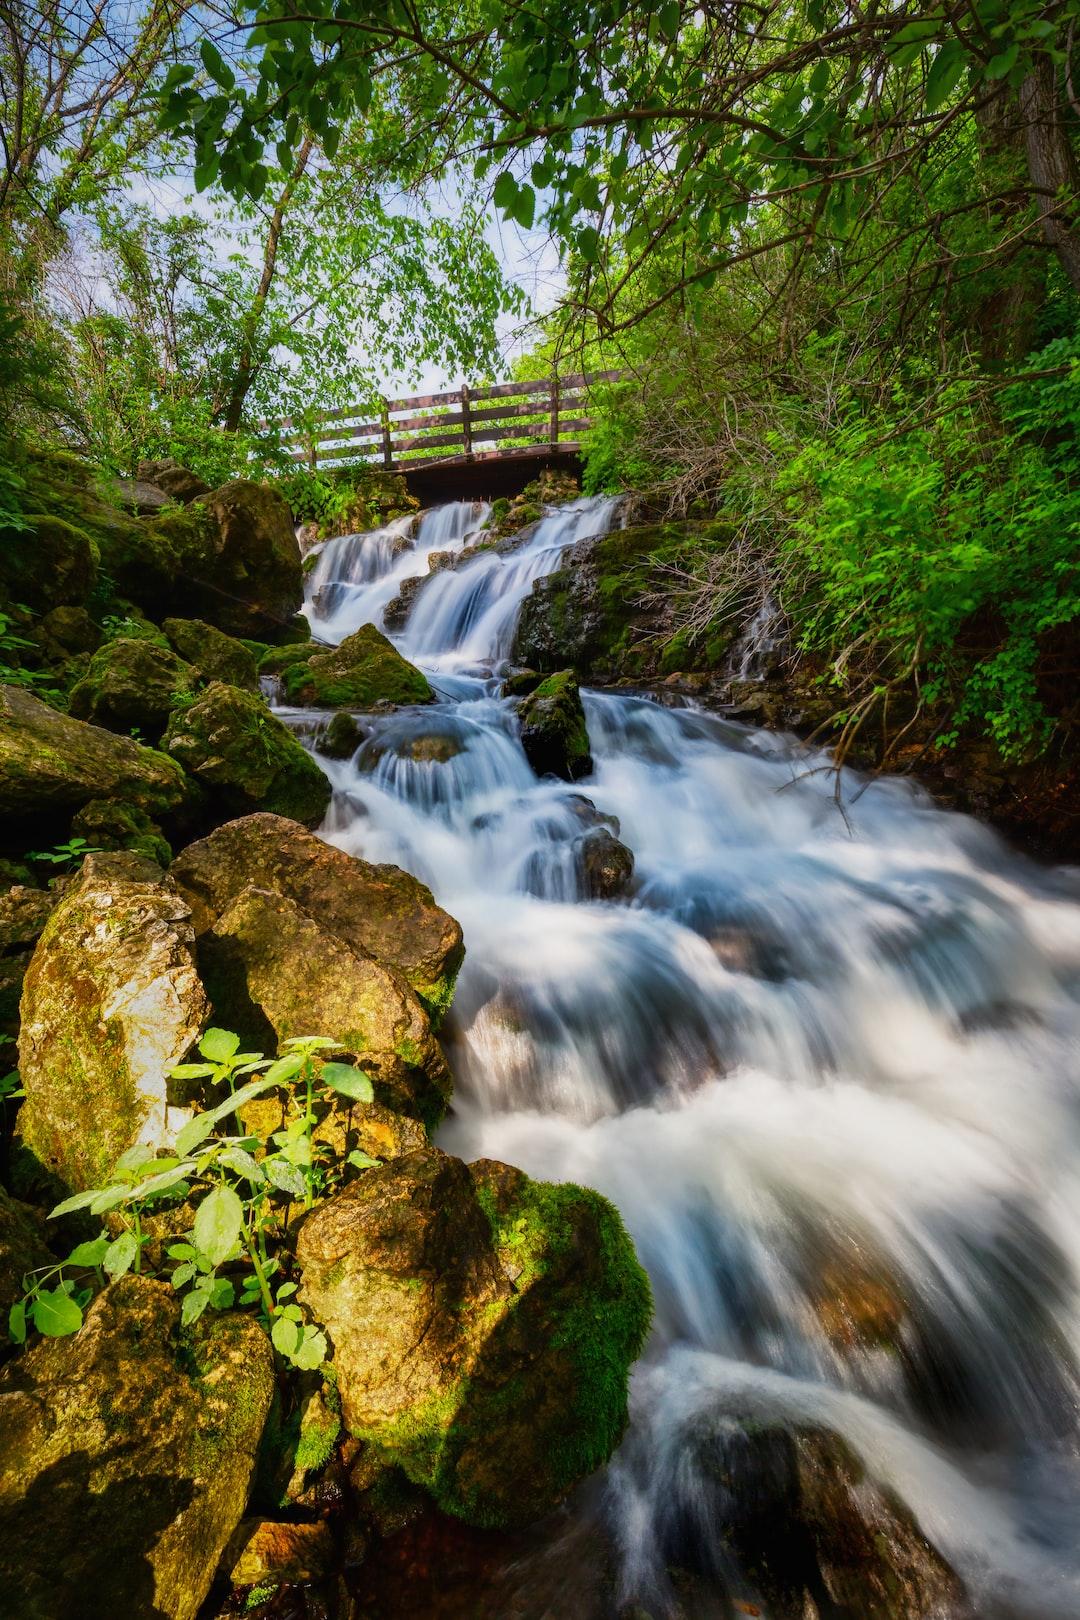 Under the Bridge | Over the Rocks  Governor Dodge State Park / Dodgeville, Wisconsin